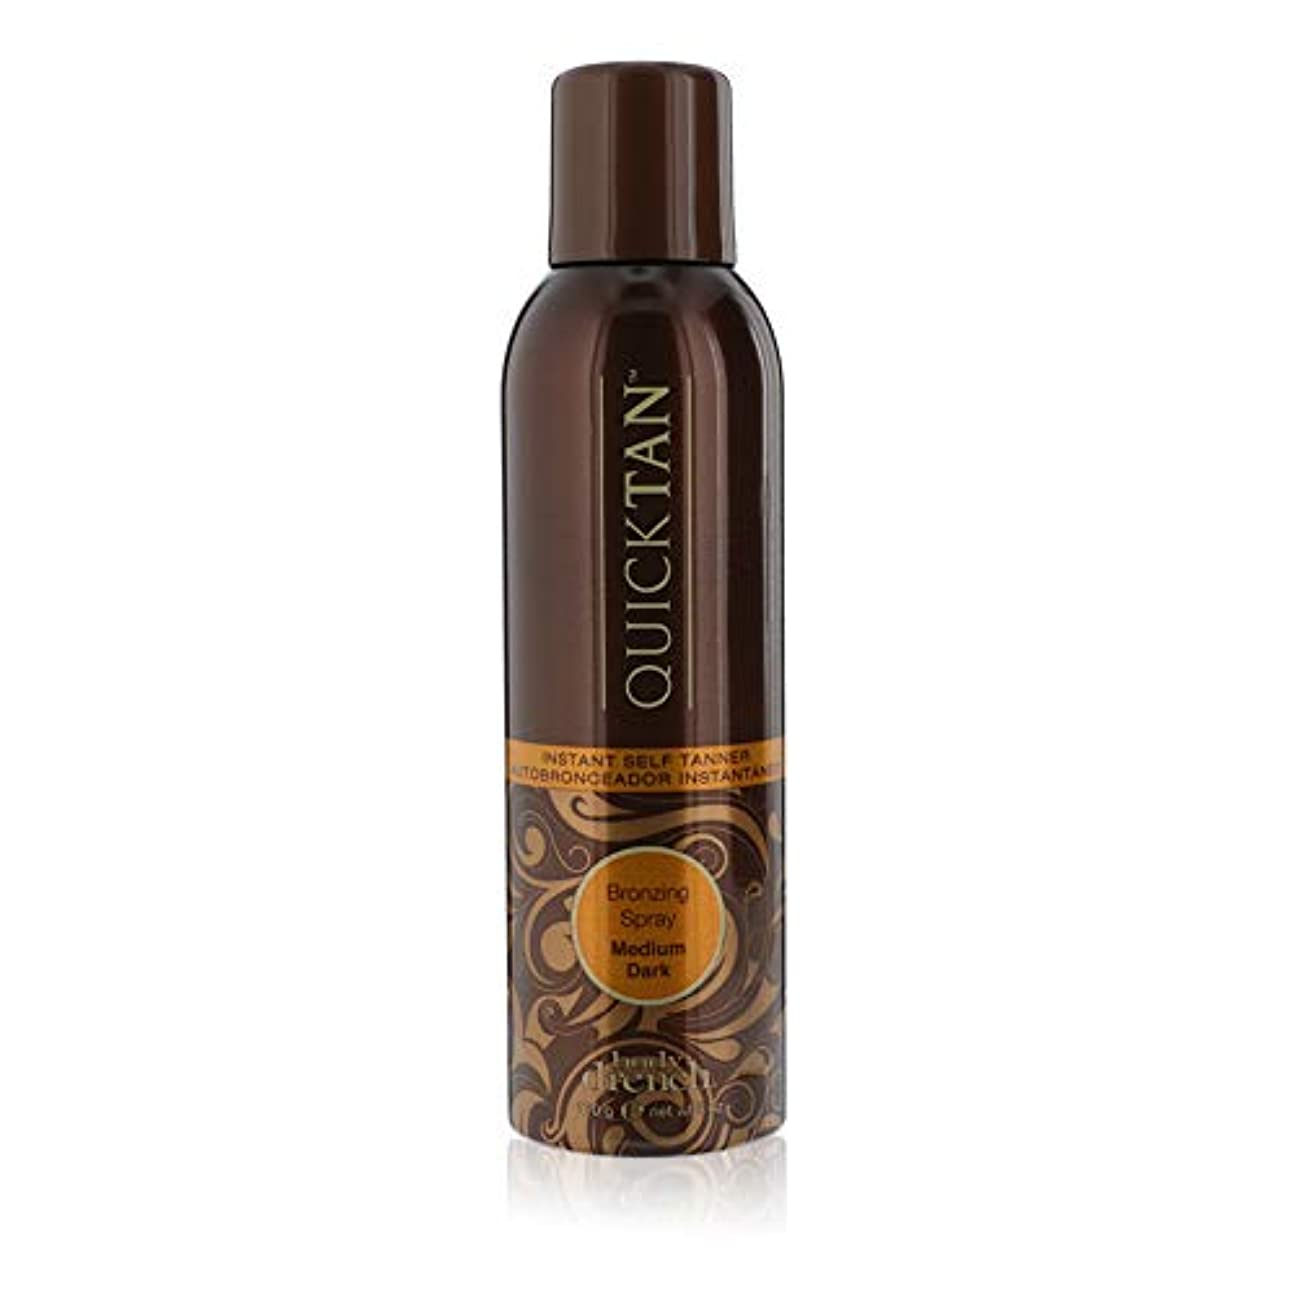 BODY DRENCH Quick Tan Bronzing Spray - Medium Dark